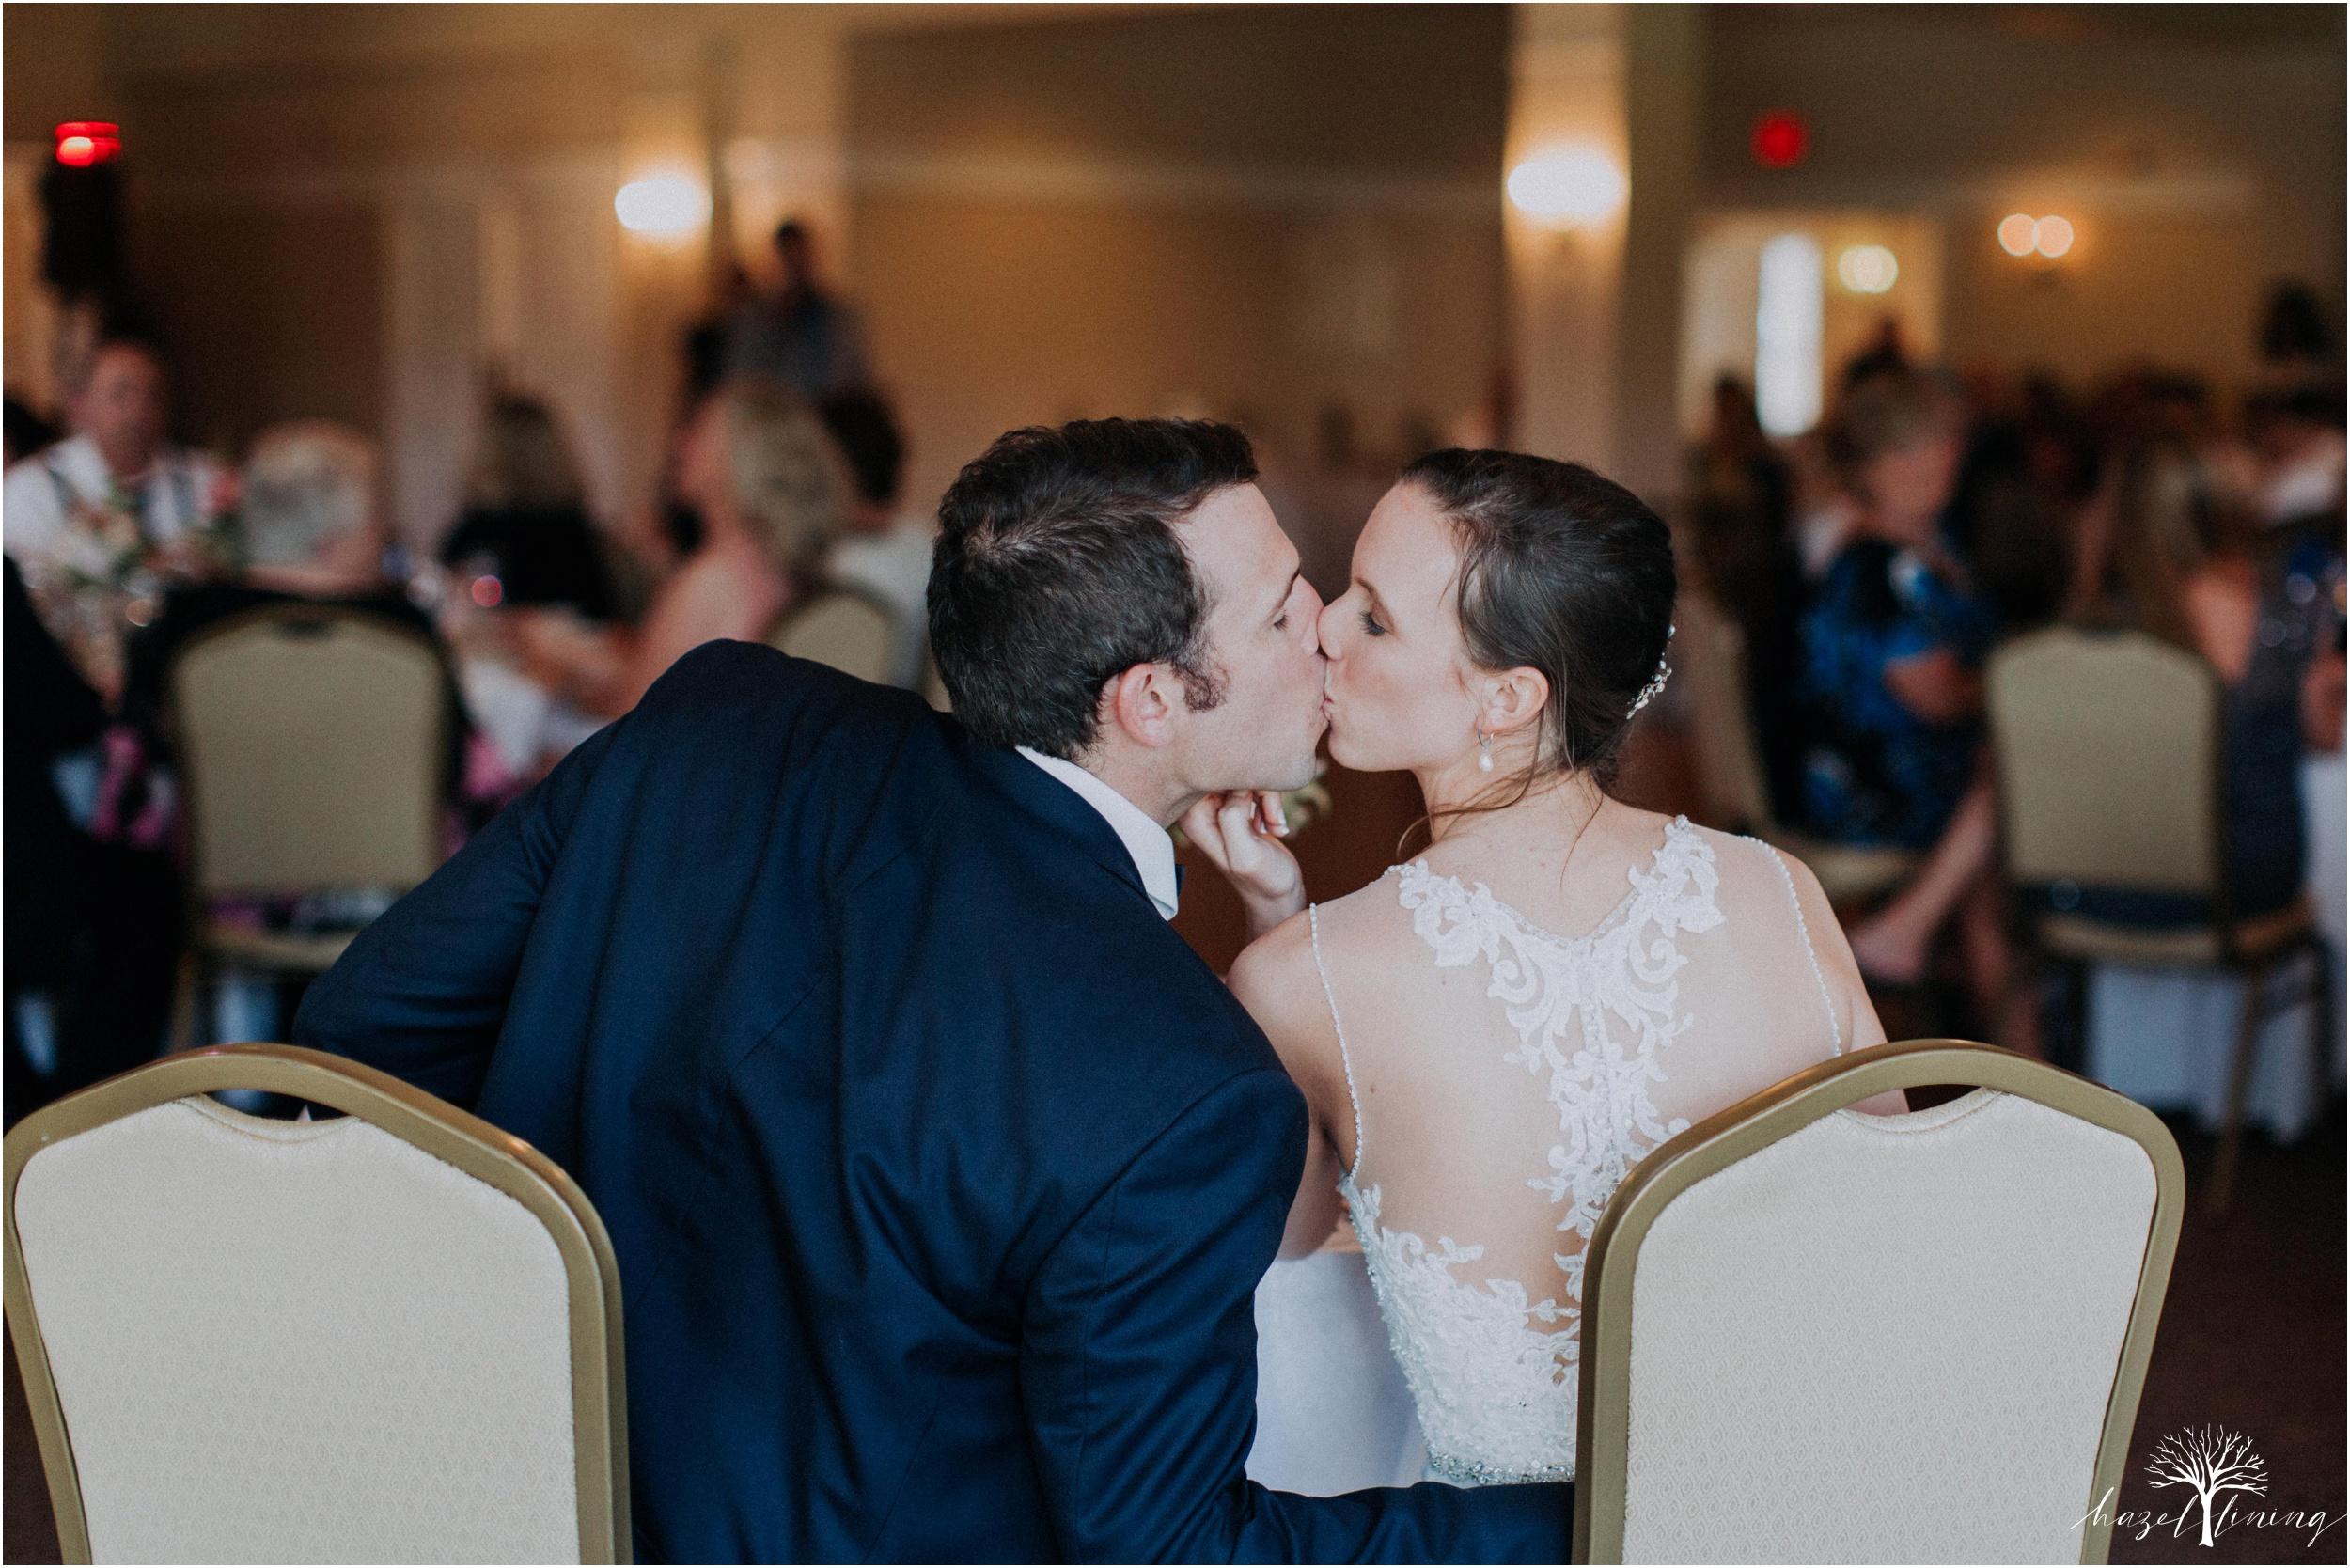 hazel-lining-travel-wedding-elopement-photography_0146.jpg